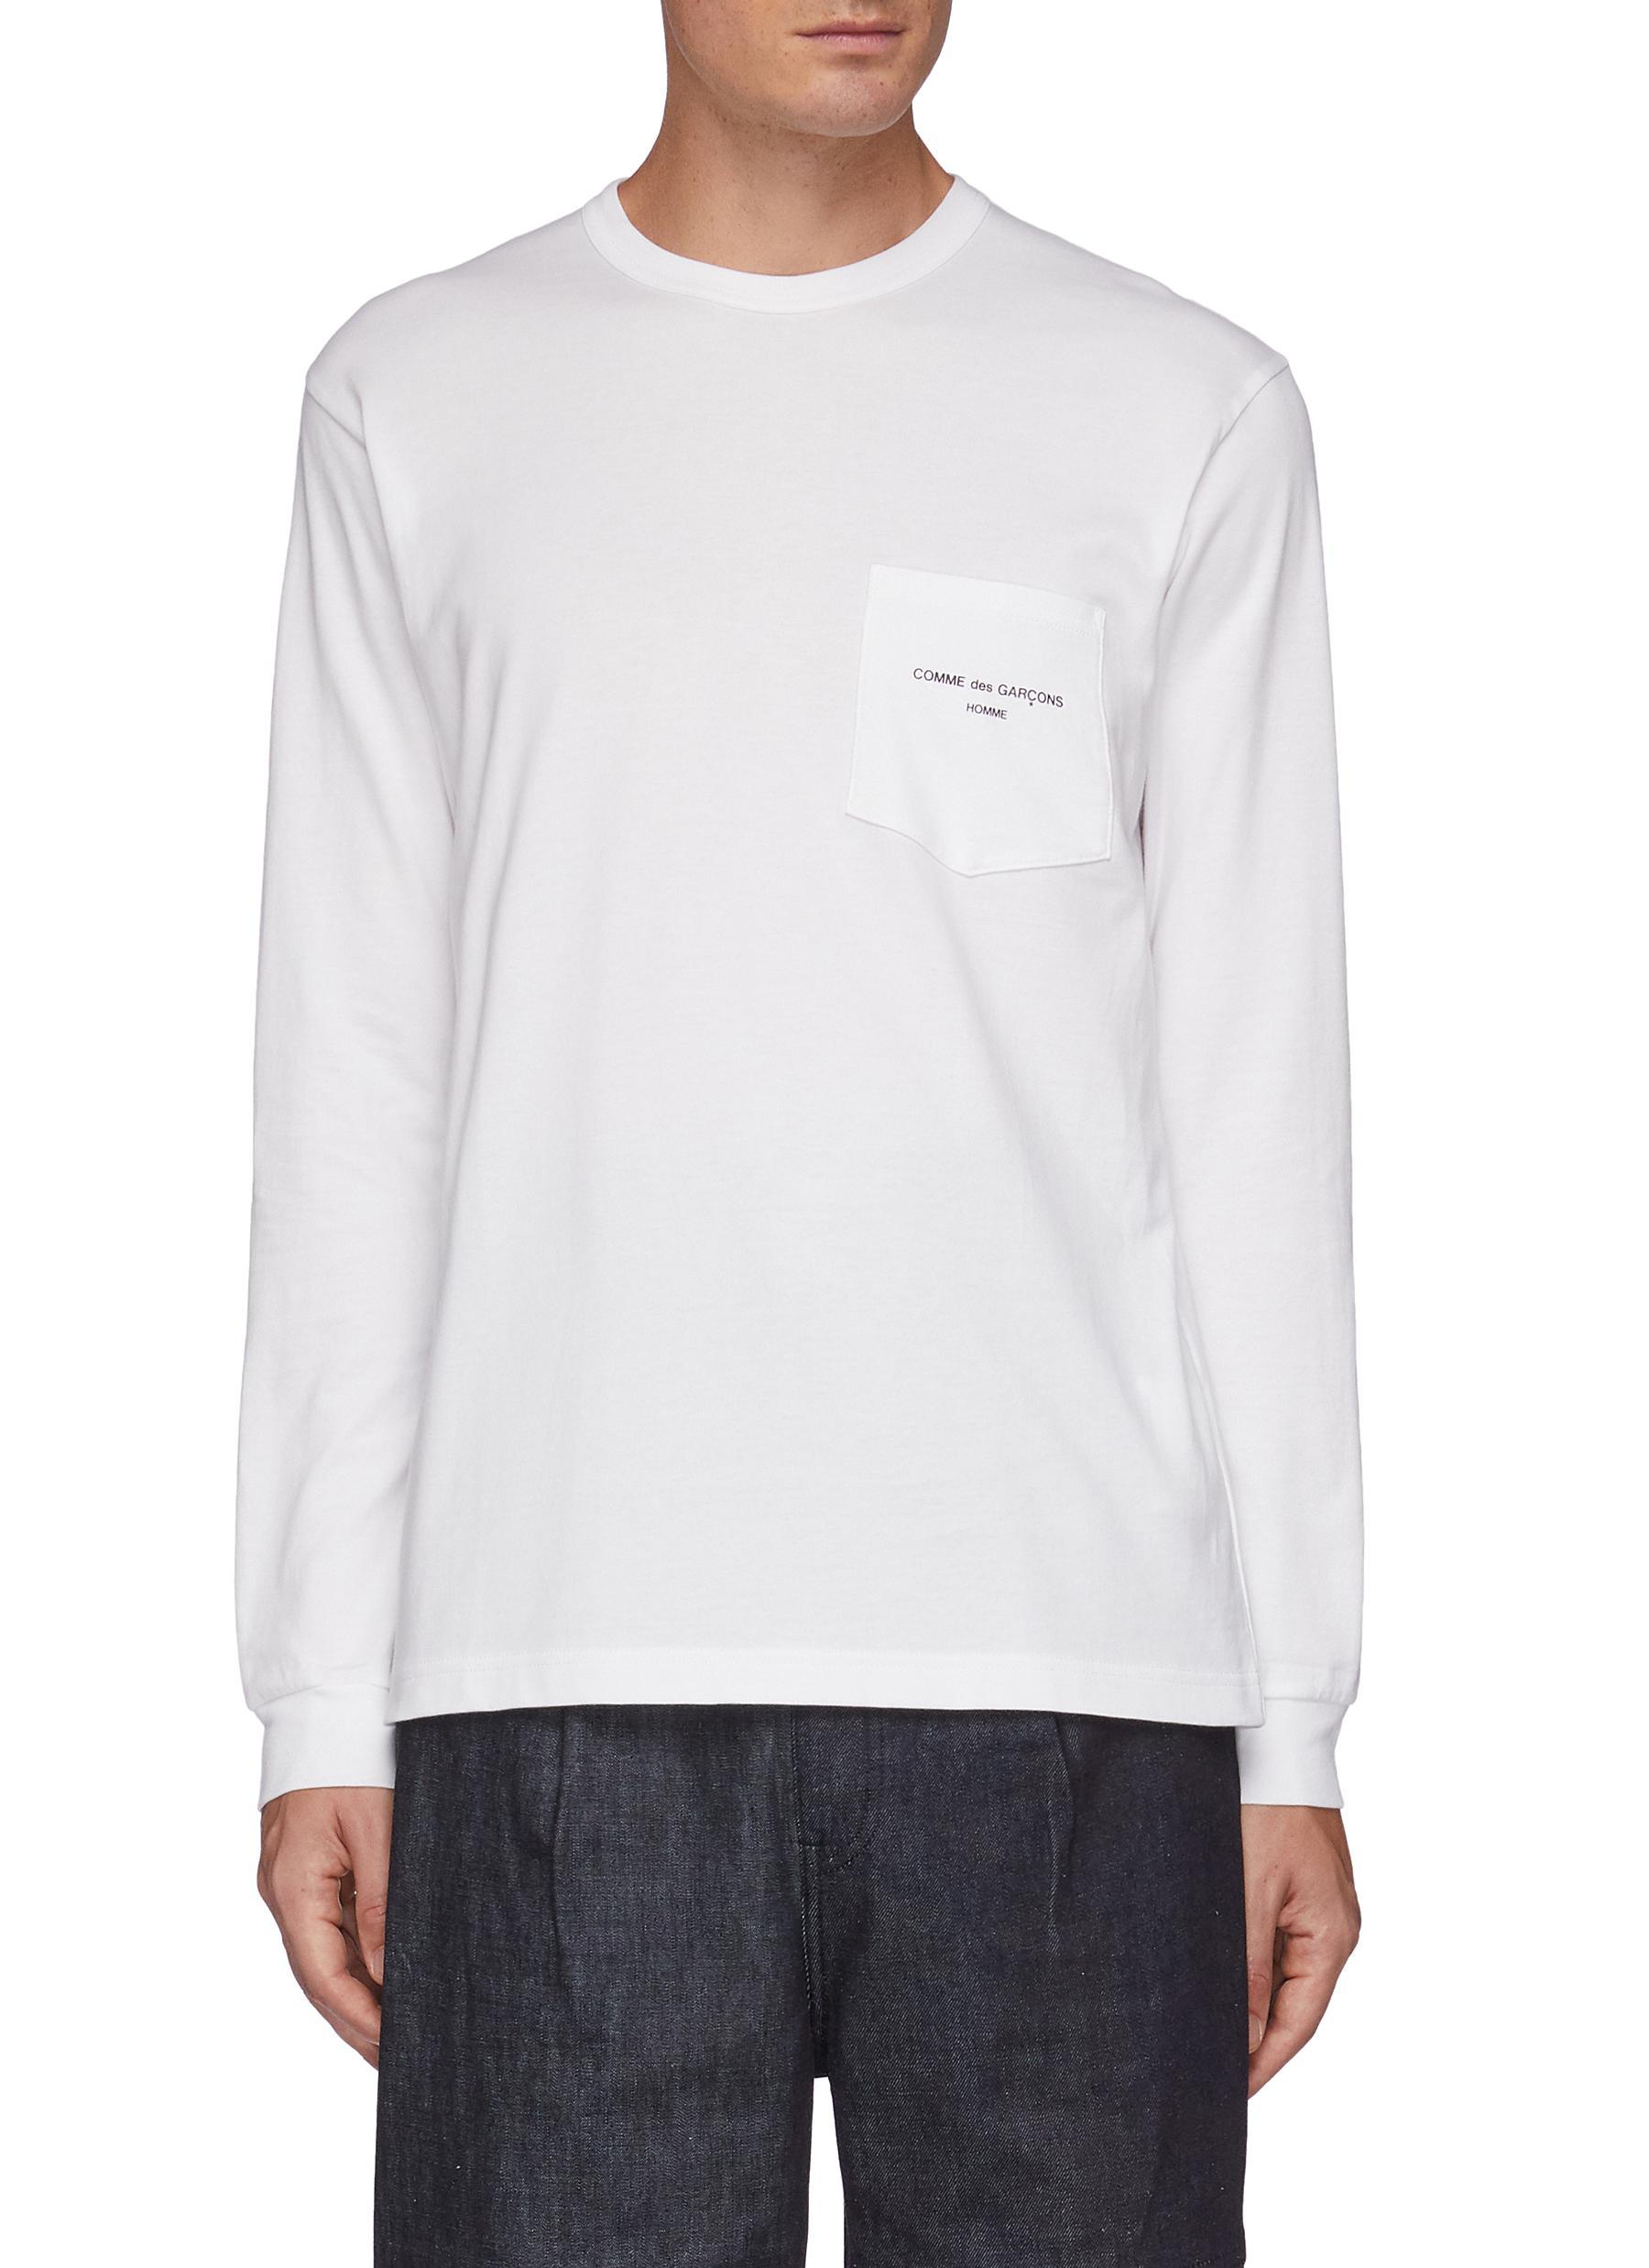 Branding Appliqued Chest Pocket Long Sleeved Crewneck Cotton T-Shirt